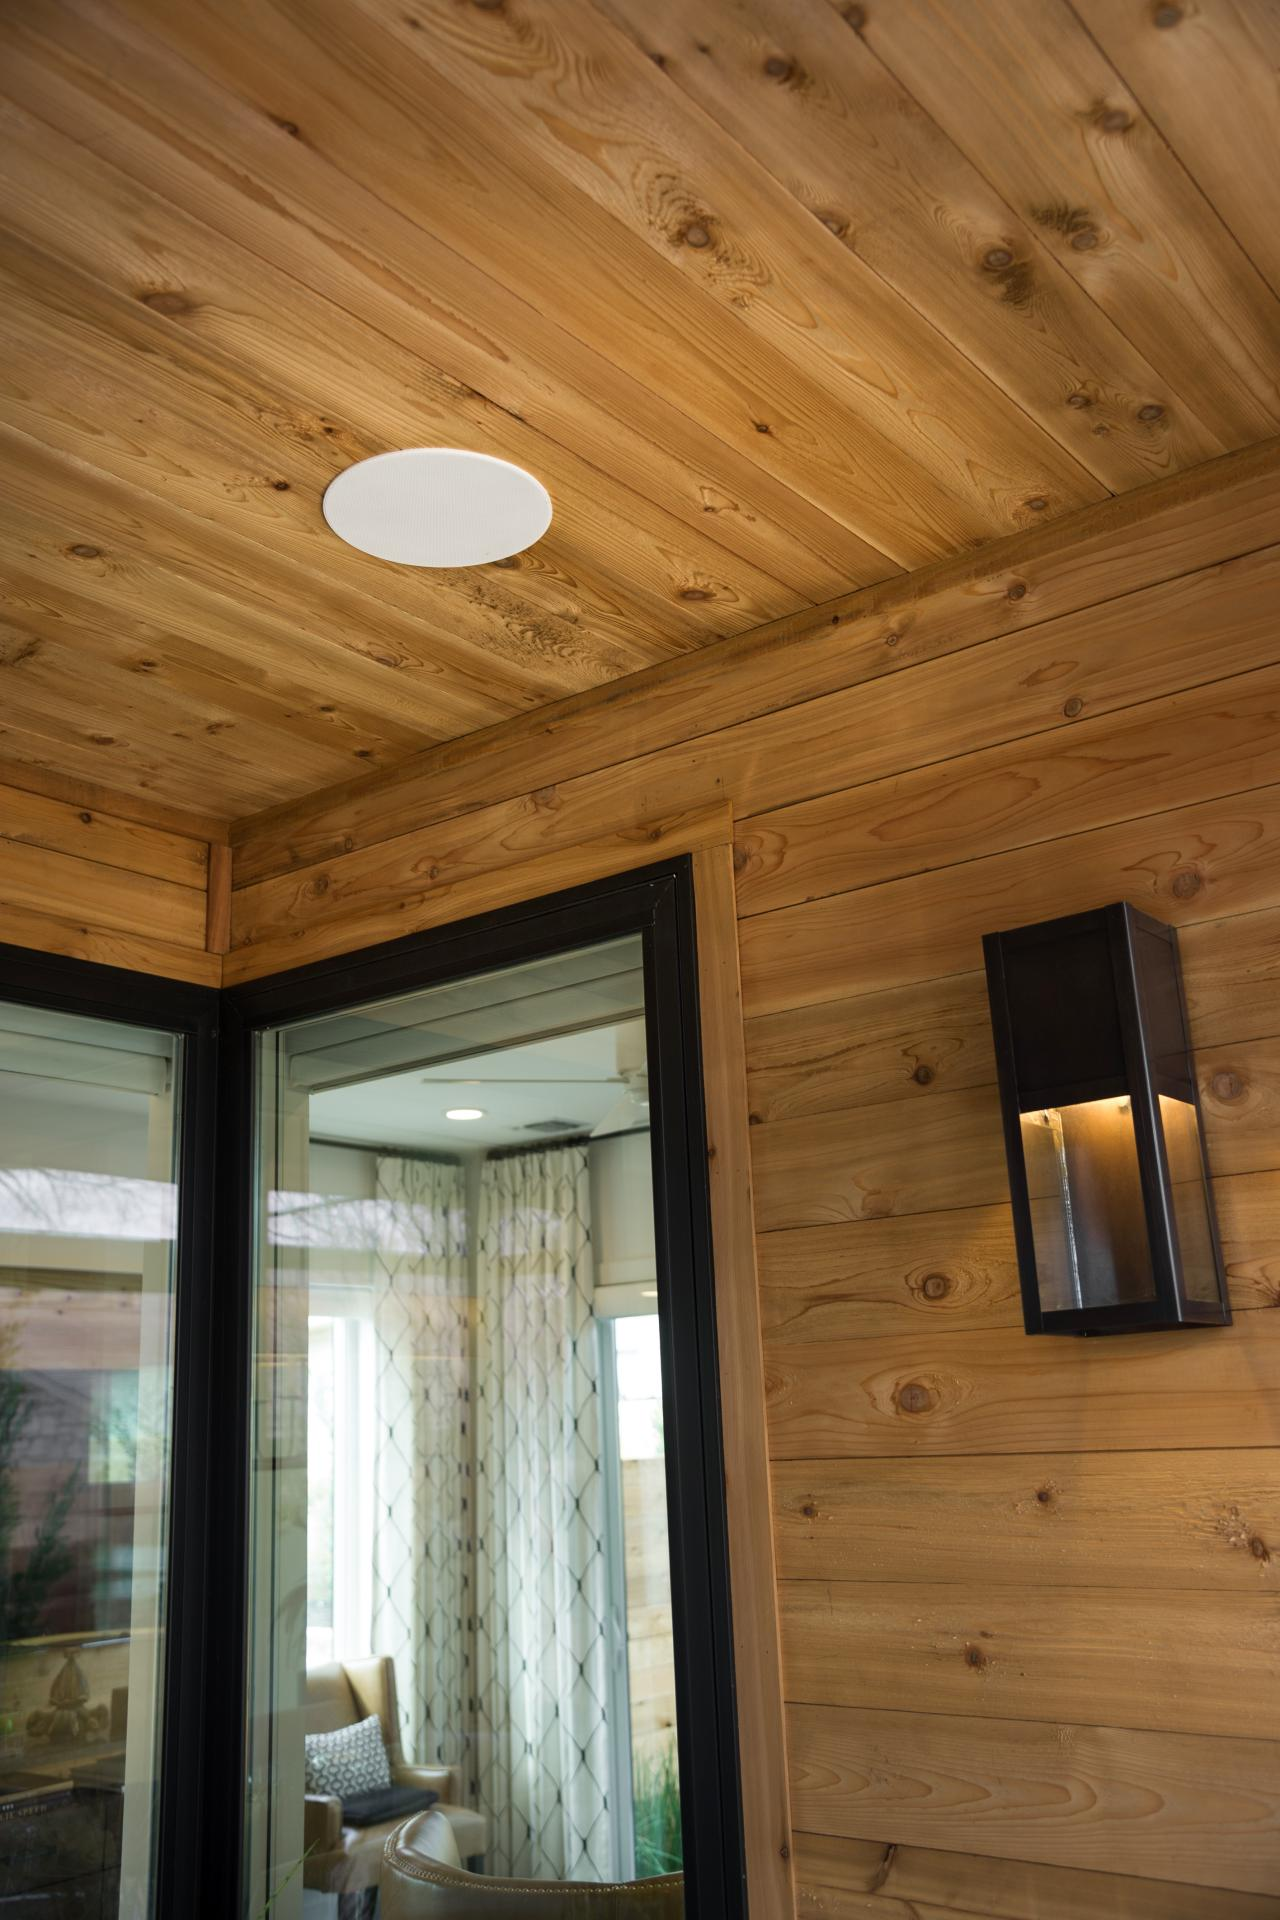 yamaha ceiling mount speakers ns visual en index products australia audio